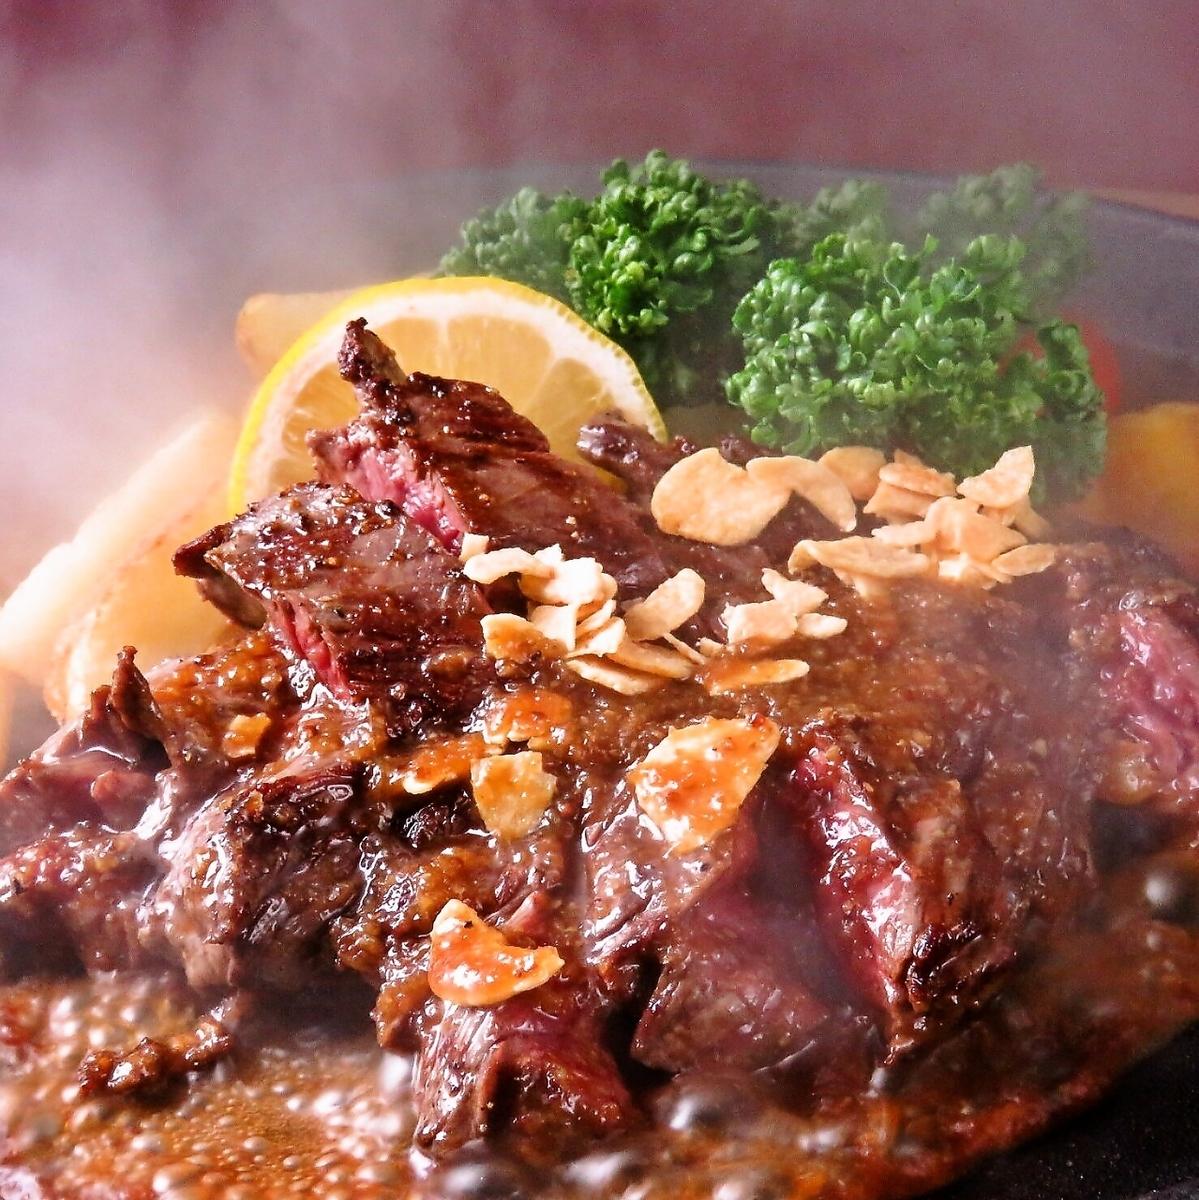 # Meat Baru beef sagarigrill (150 g)